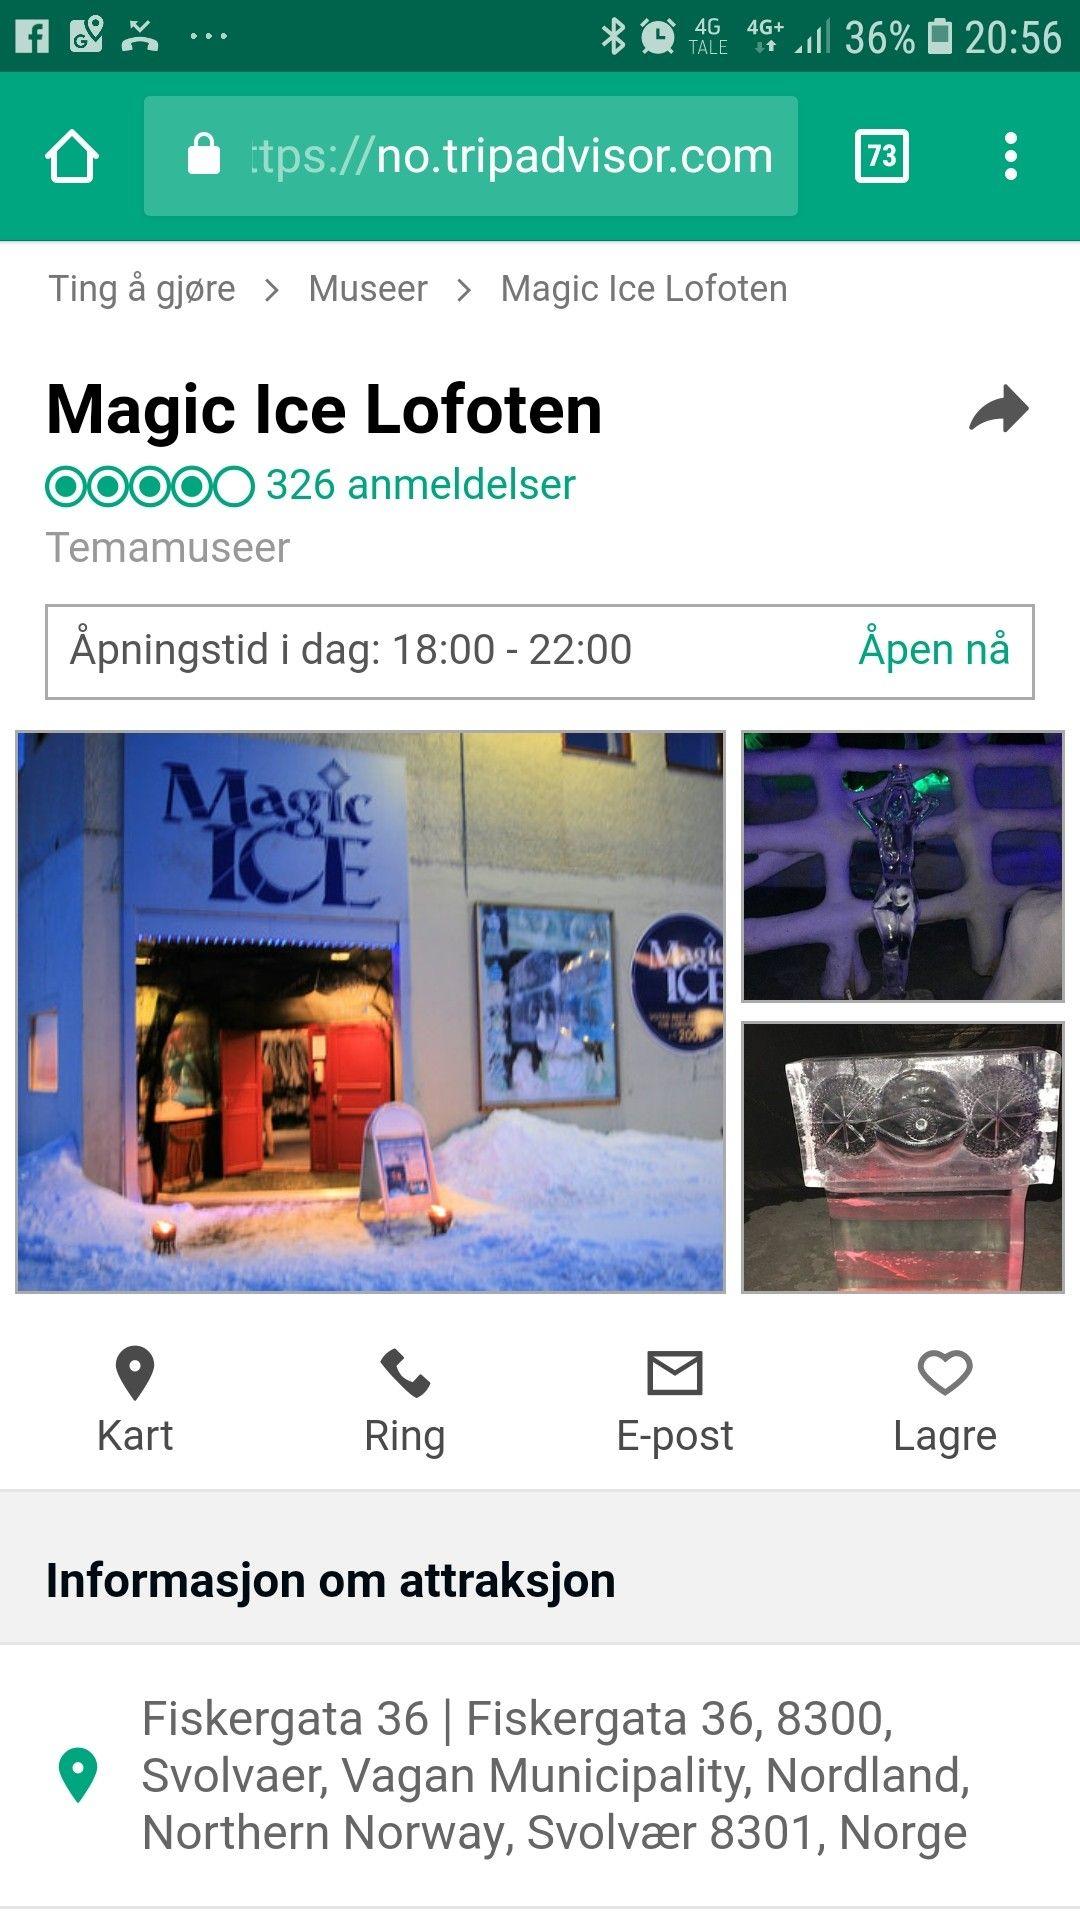 4g kart norge Pin by Lisa Ponomarev on Lofoten | Pinterest | Lofoten 4g kart norge